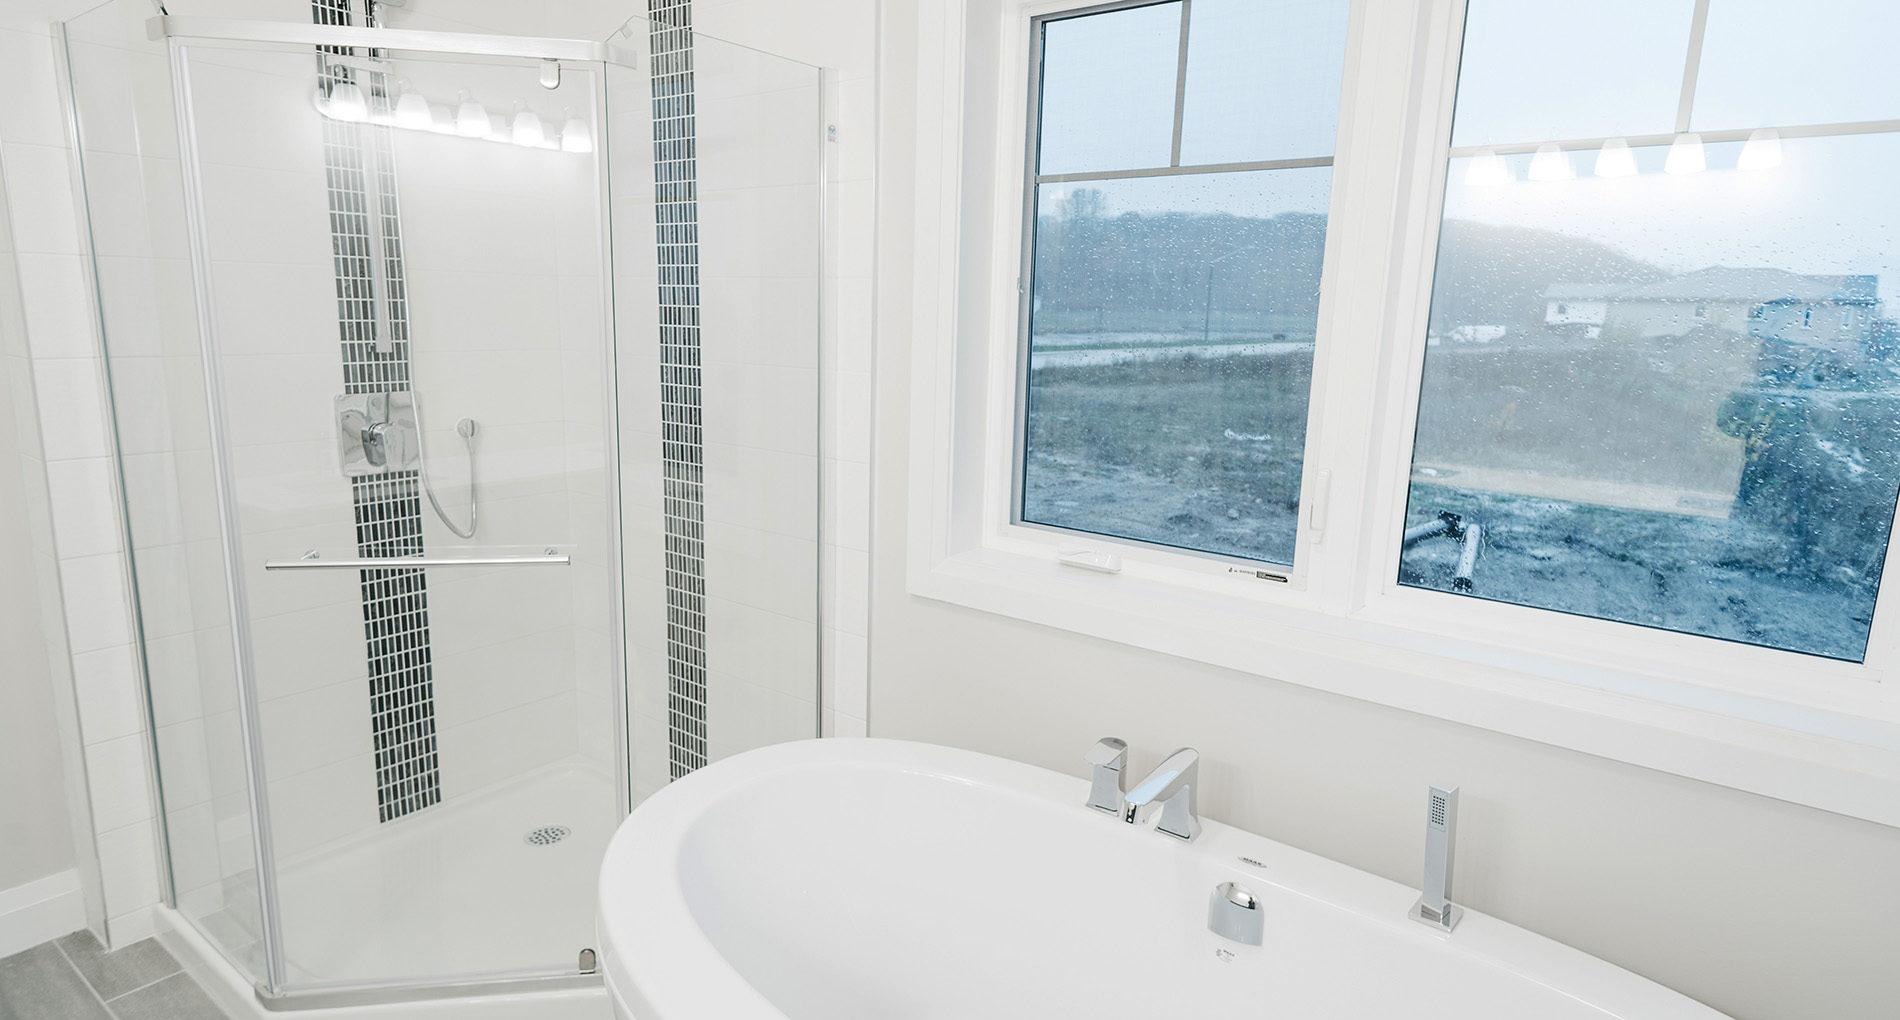 Bathroom Renovation Springwater Waterfront Slider